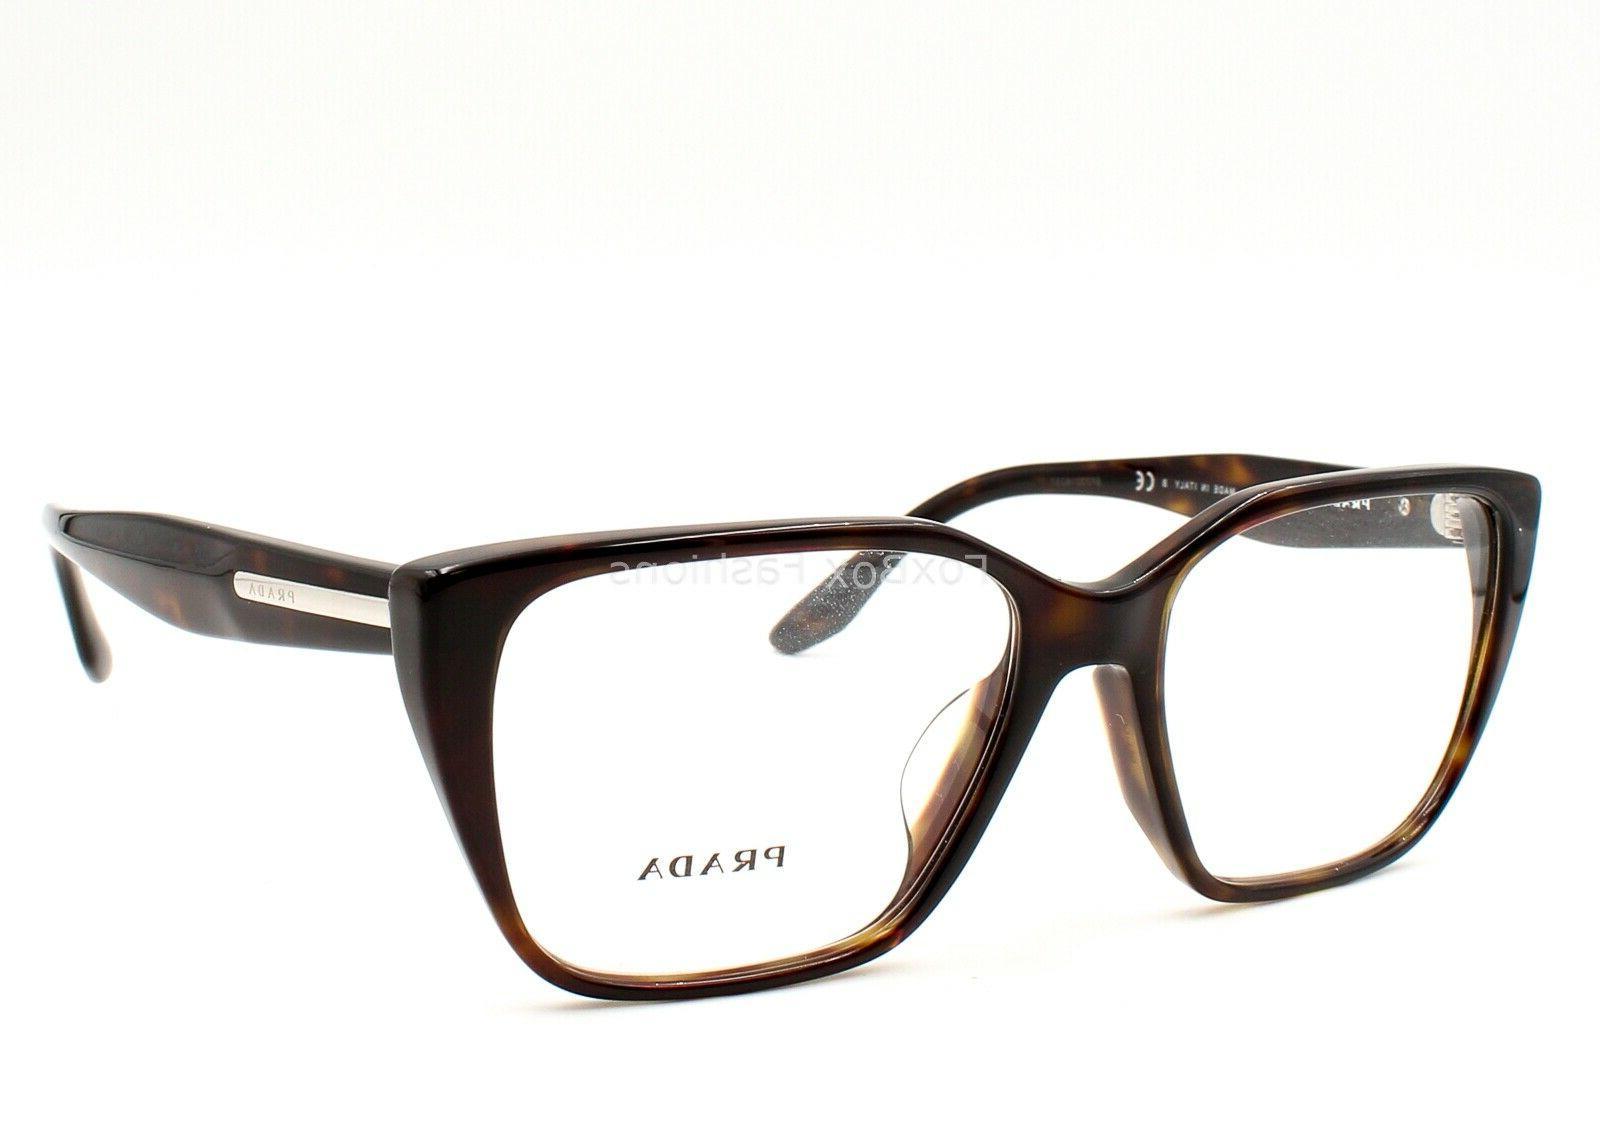 PRADA JOURNAL 08T-F 2AU-1O1 Eyeglasses Frame Glasses Tortois